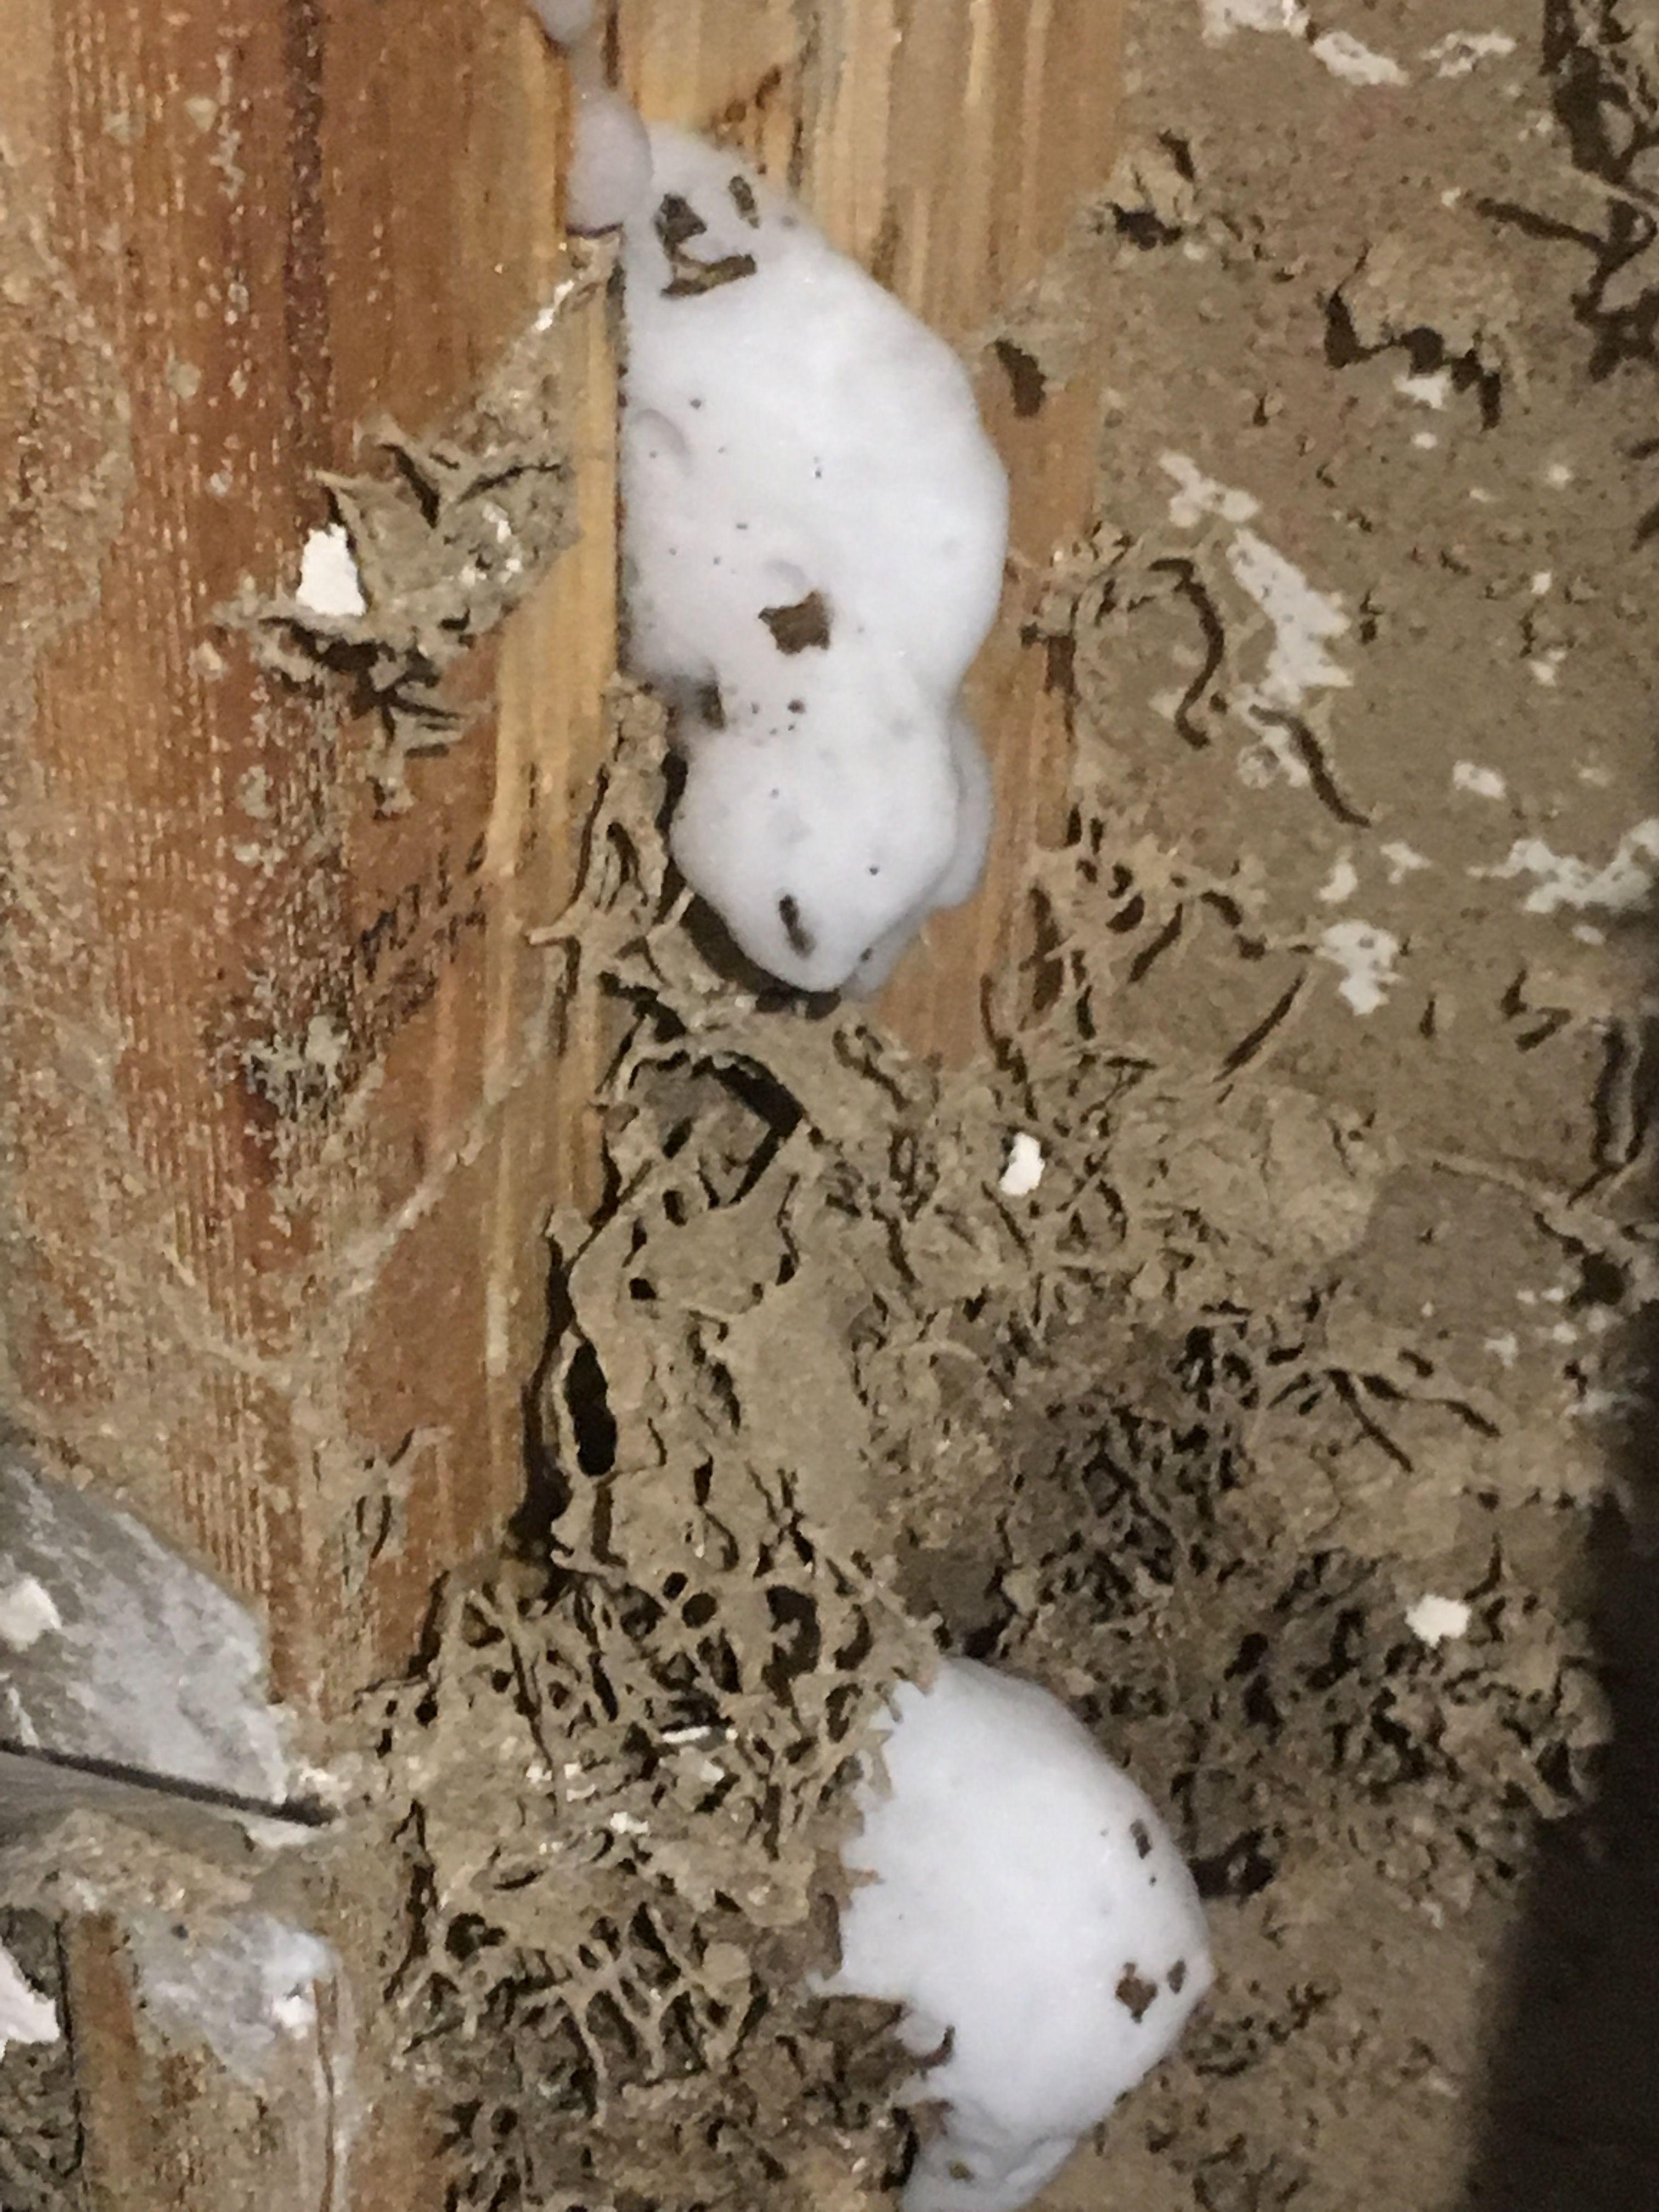 Gallery Bob Gunn Termite Solutions In Brisbane Qld Termites Wood Termites Termite Damage